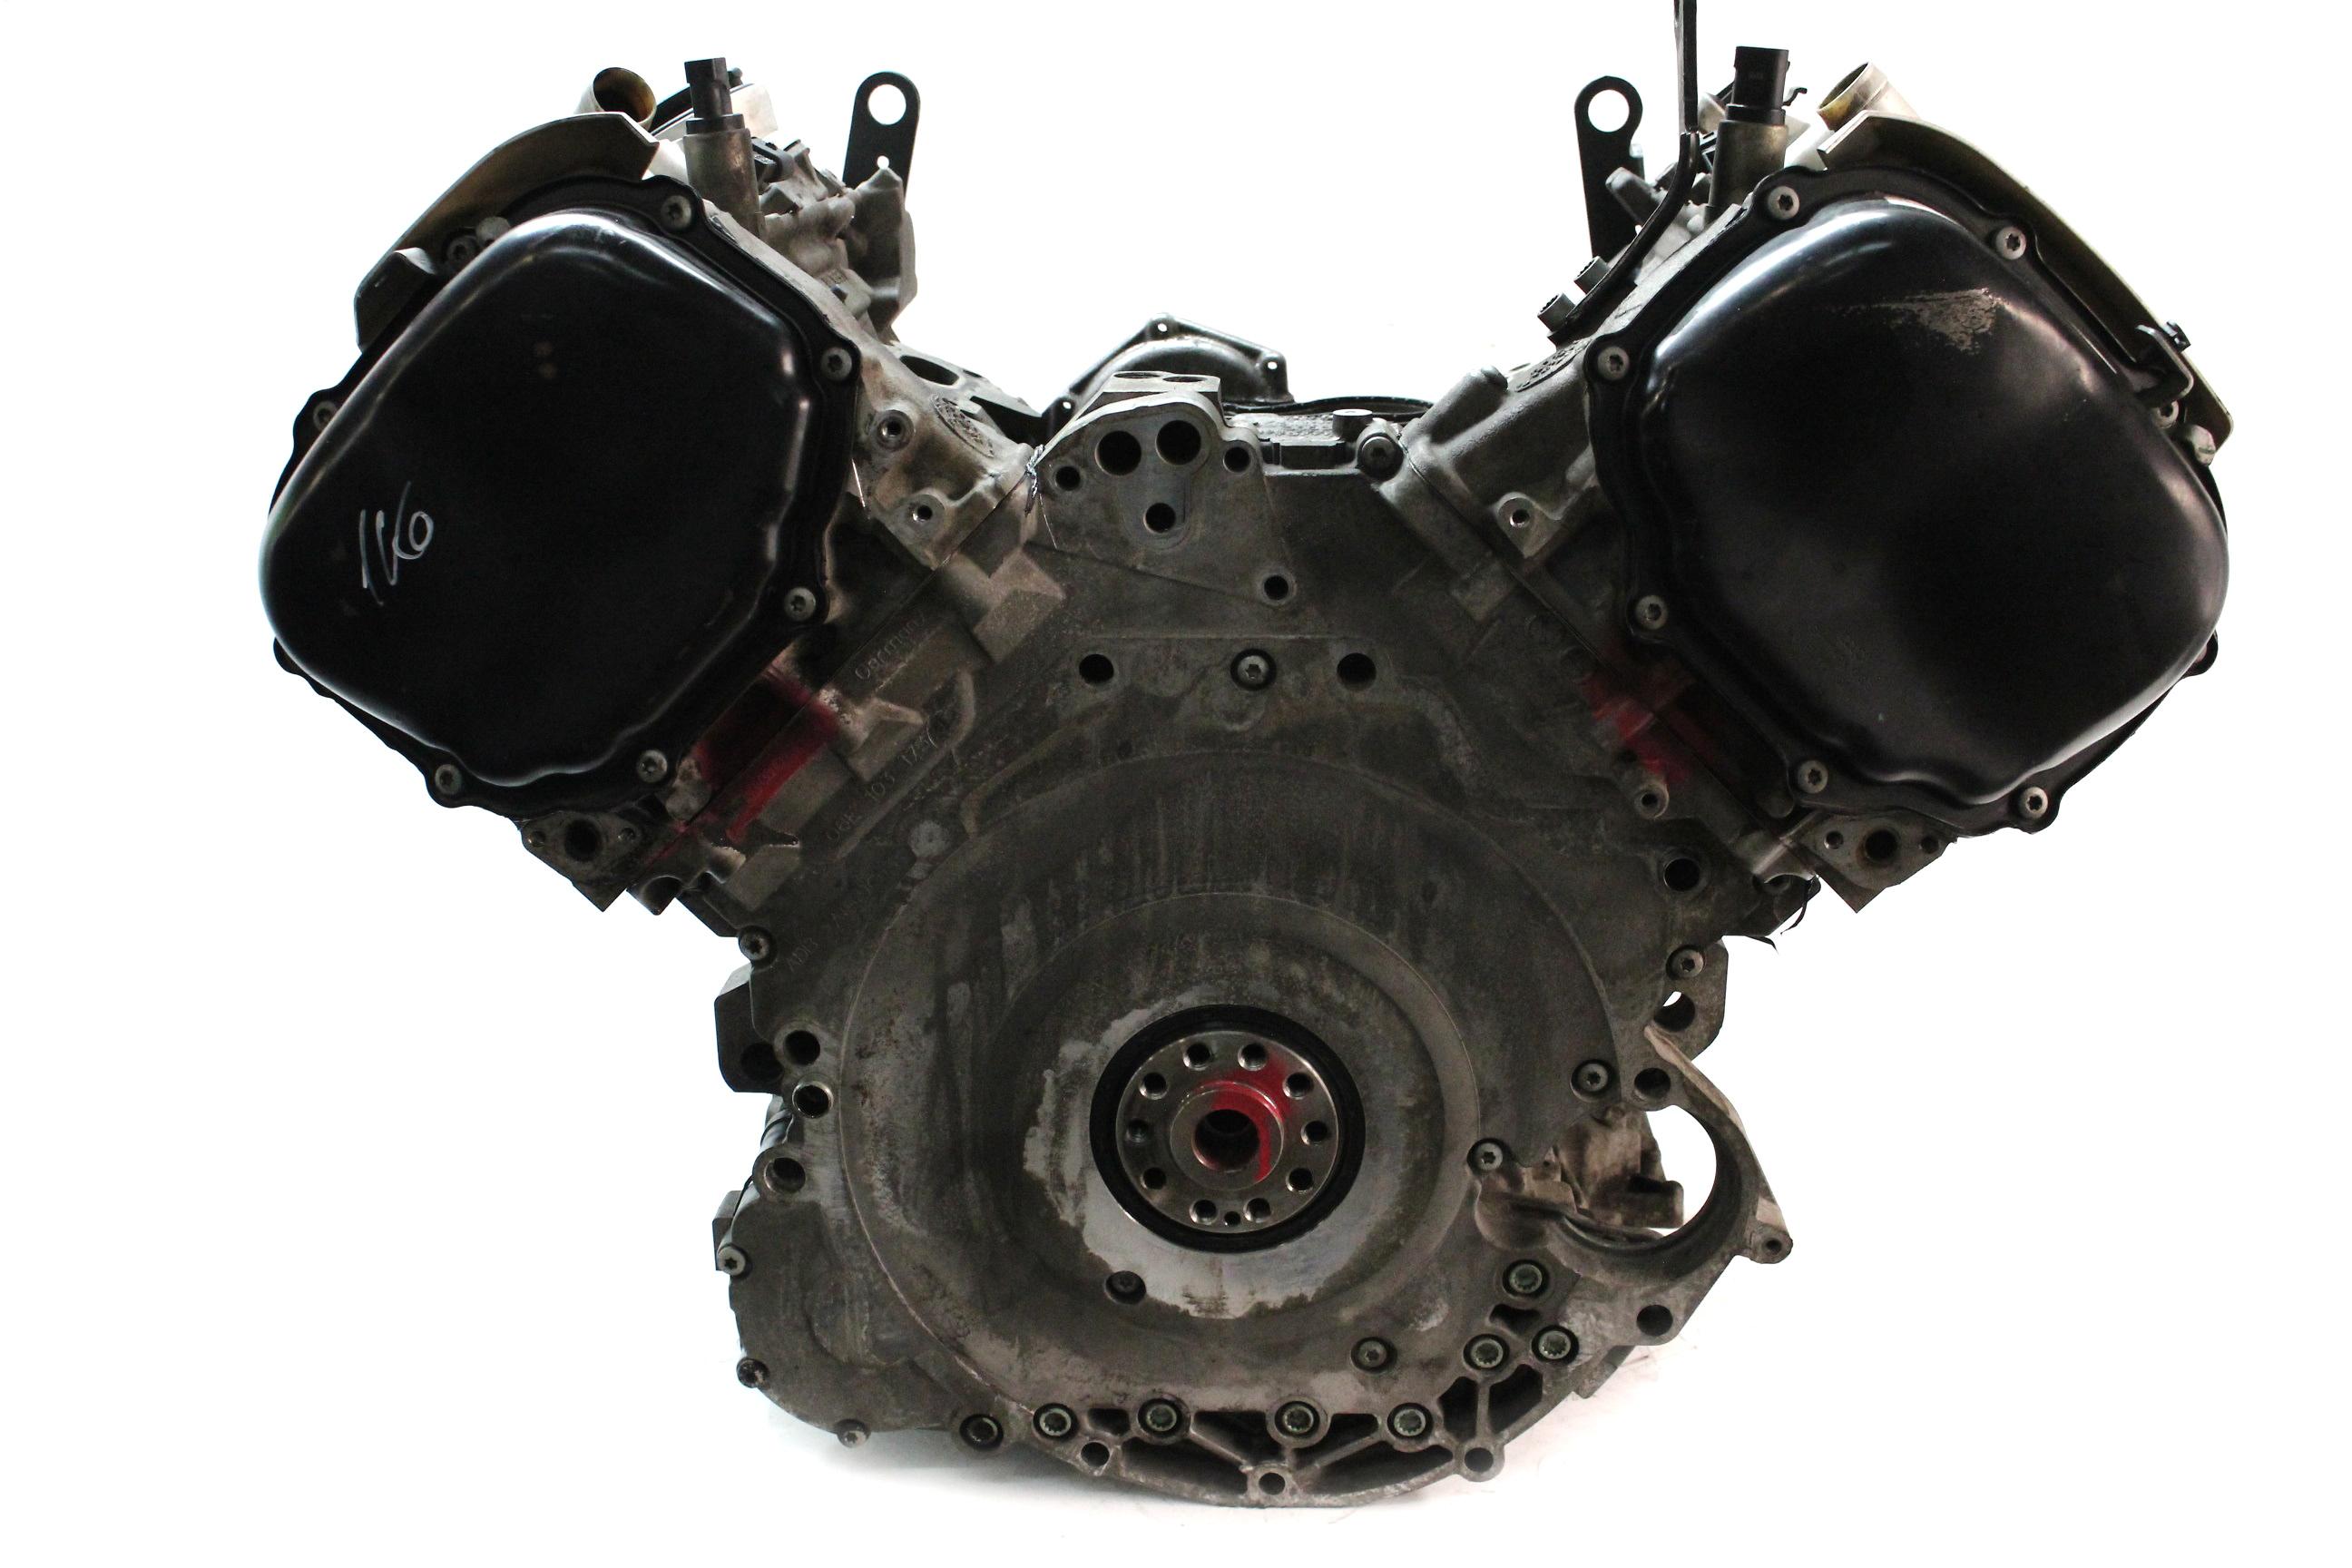 Motor 2006 Audi A6 C6 2,4 V6 BDW 177 PS